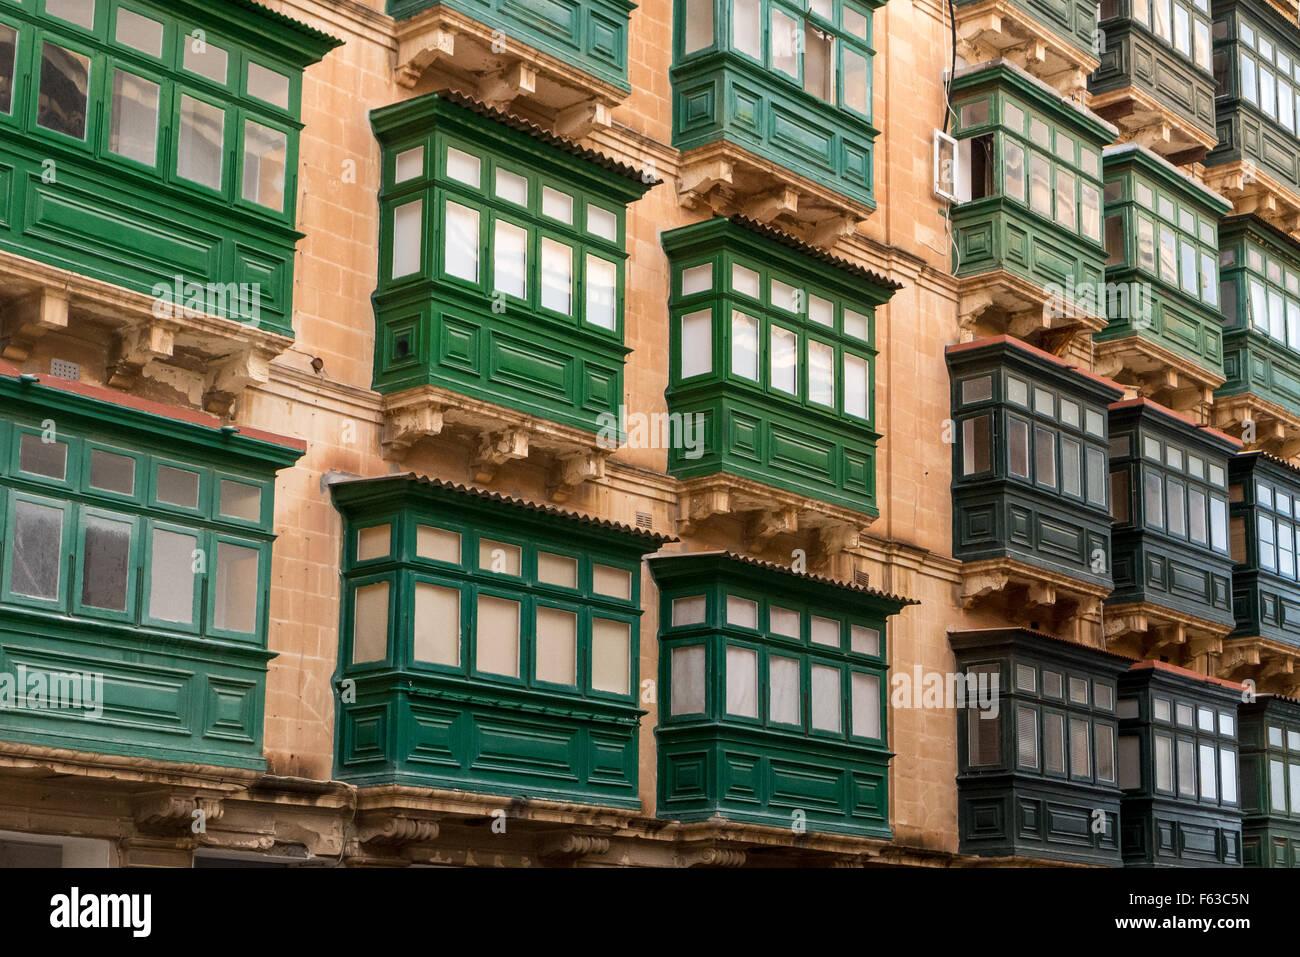 Green balconies and general cityscape in Valletta, Malta. - Stock Image